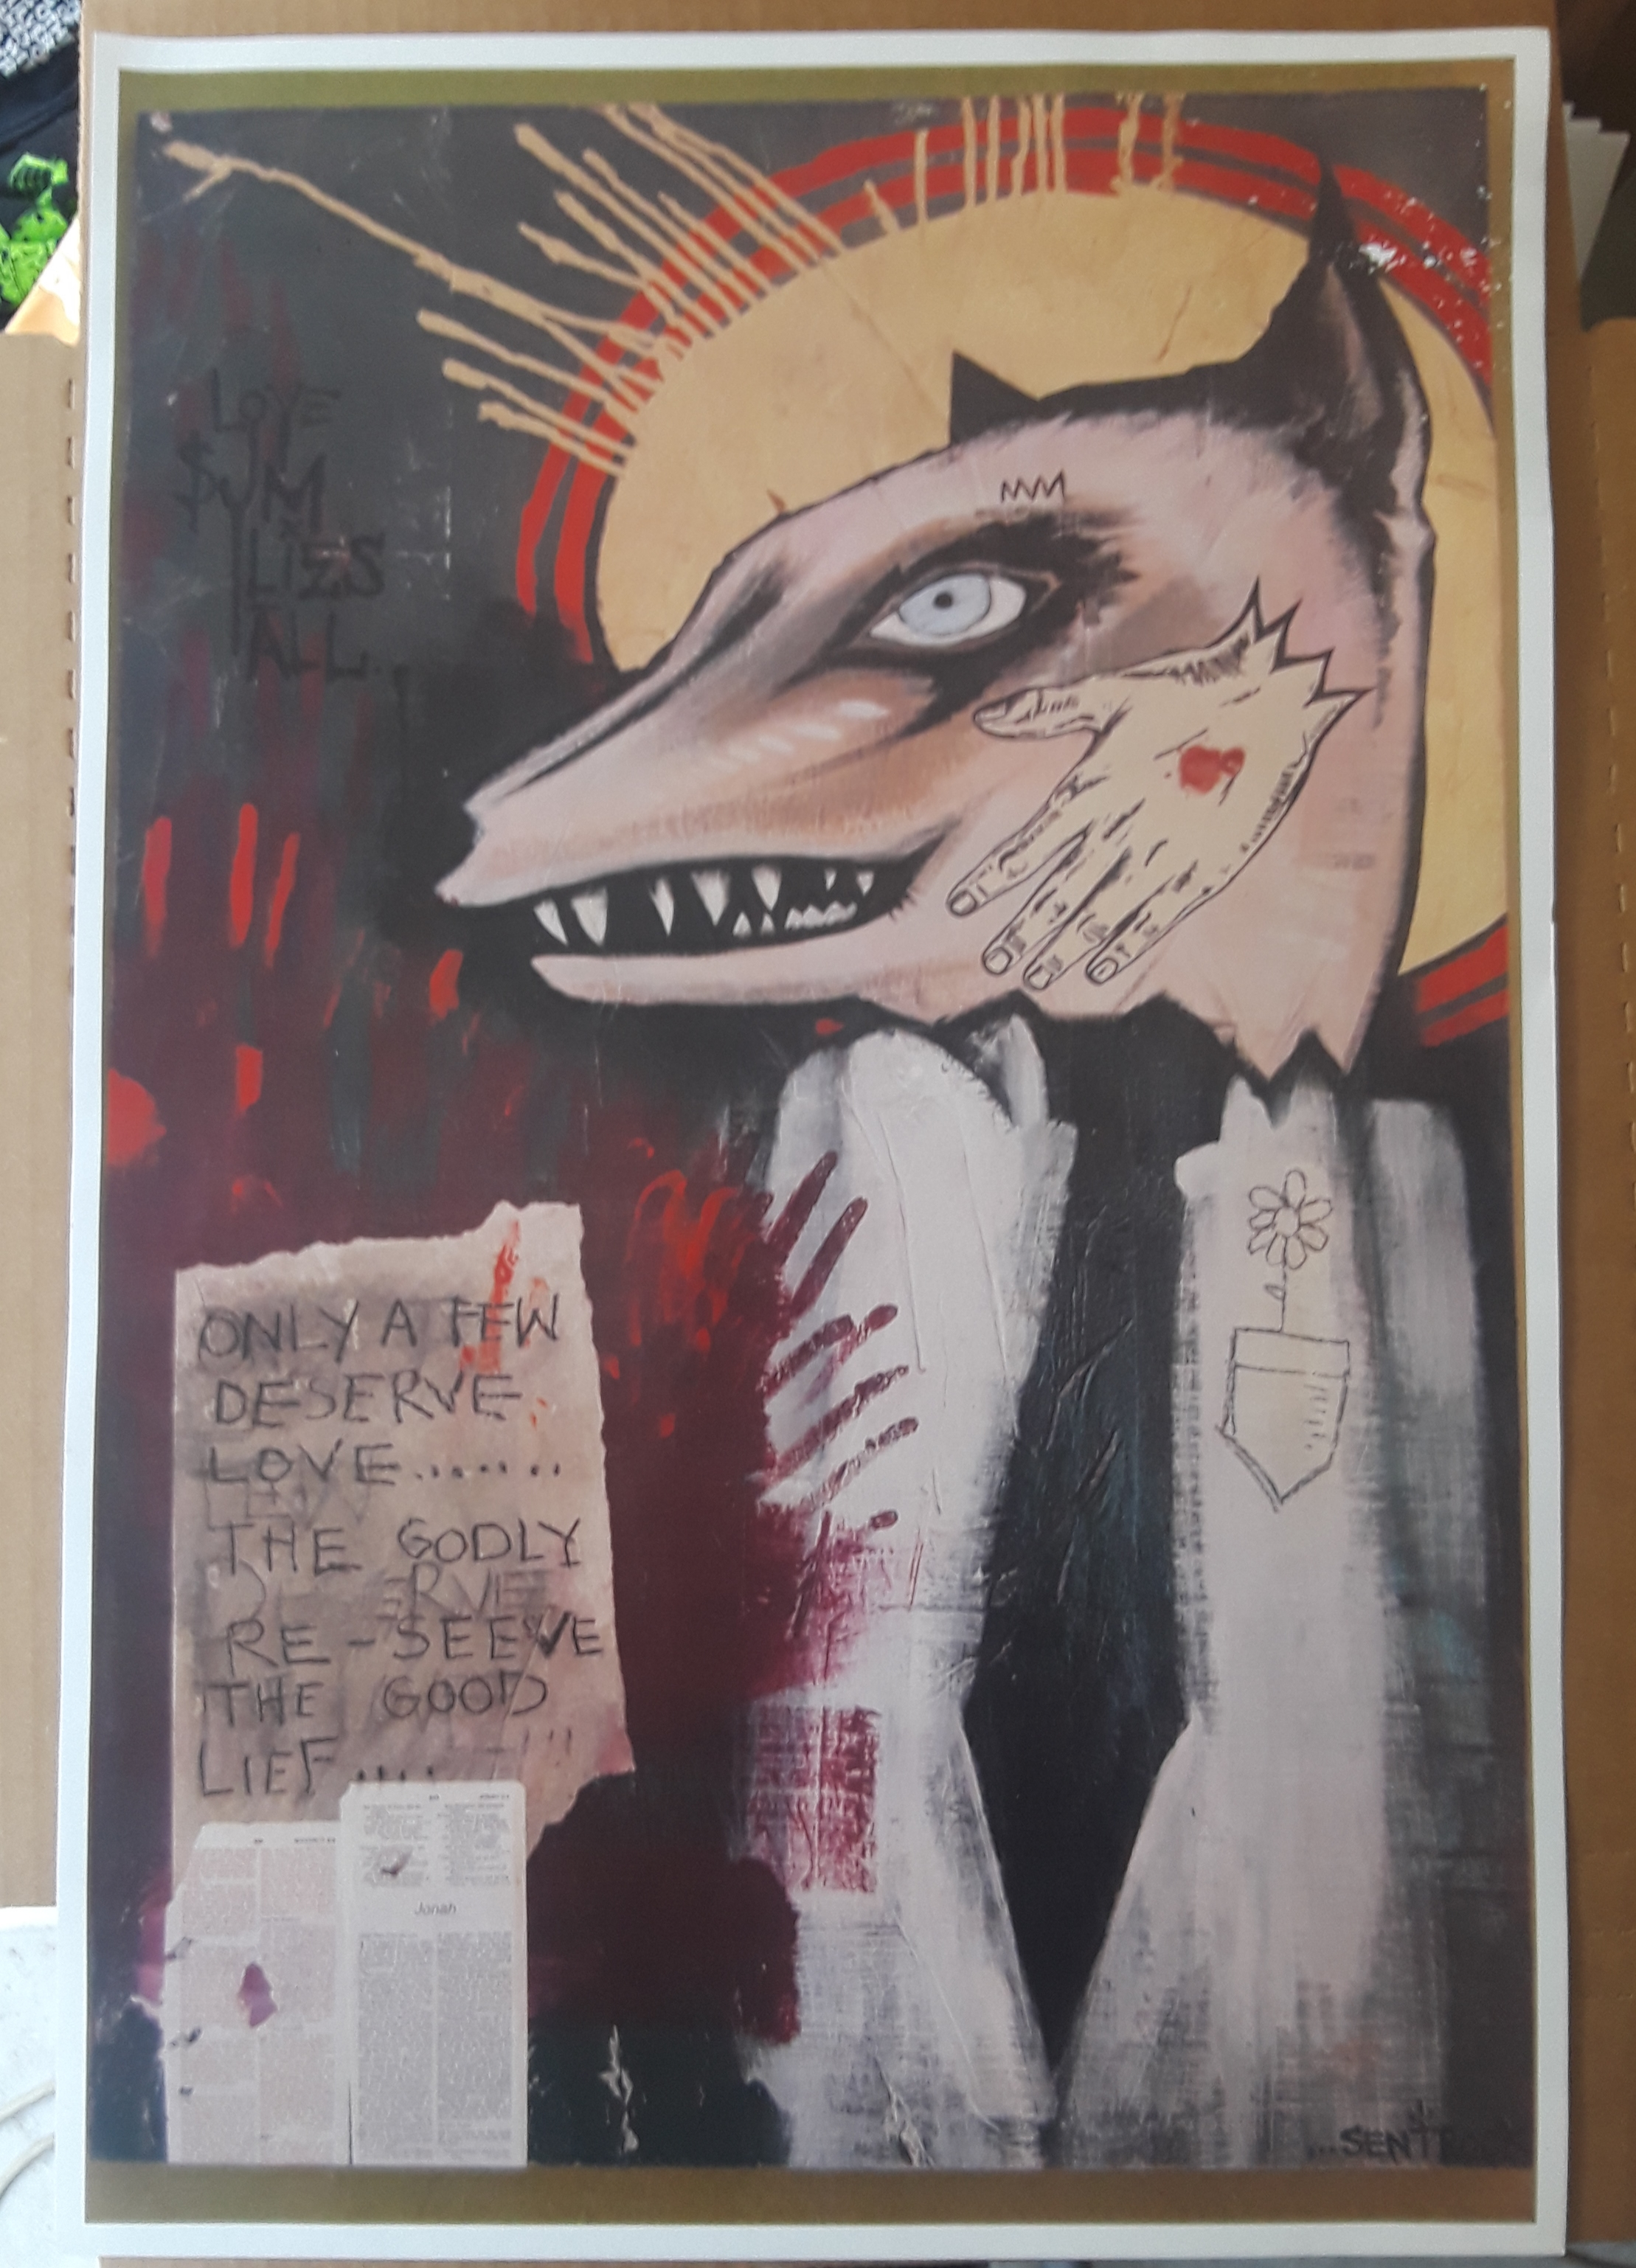 ANDREW JACKSON JIHAD poster